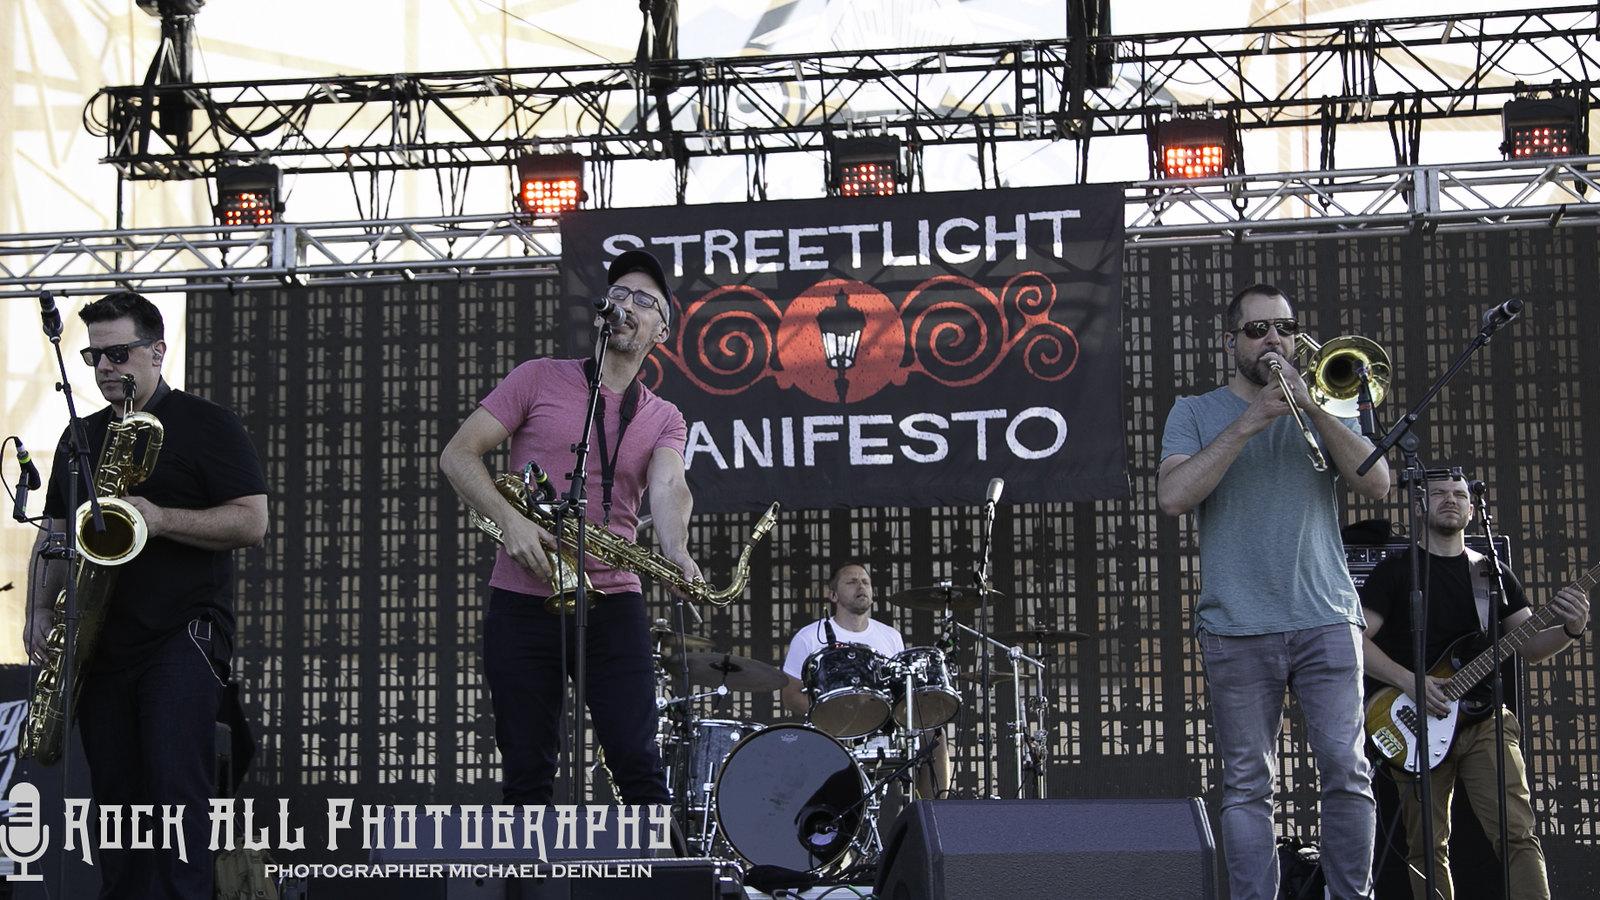 Streetlight Manifesto – Bunbury Music Festival 2019 Day 3